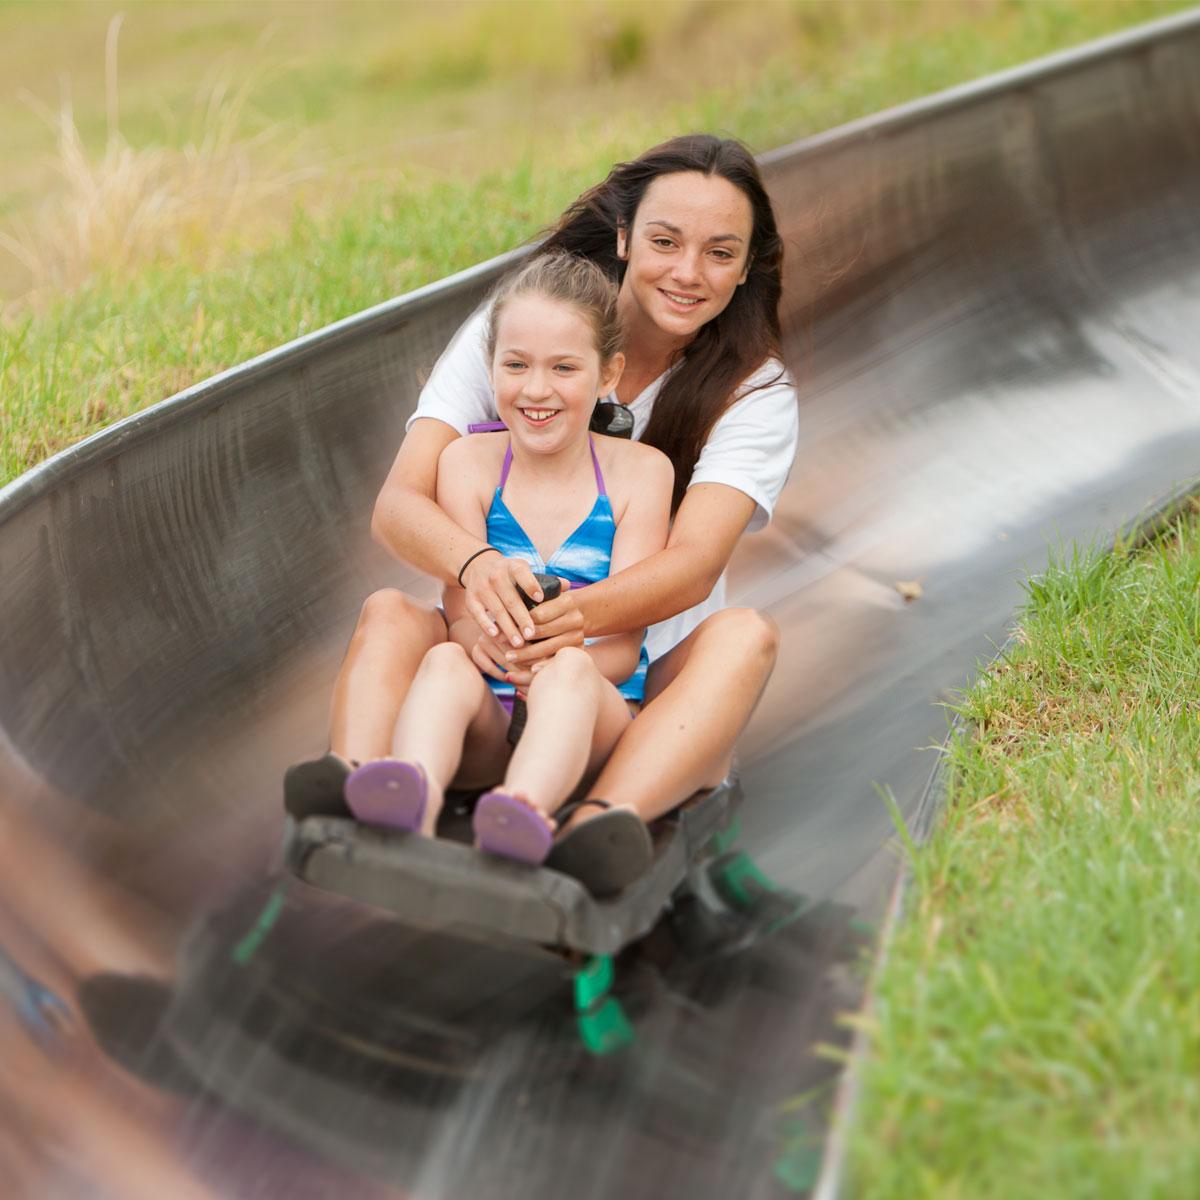 rides-bobsled-3